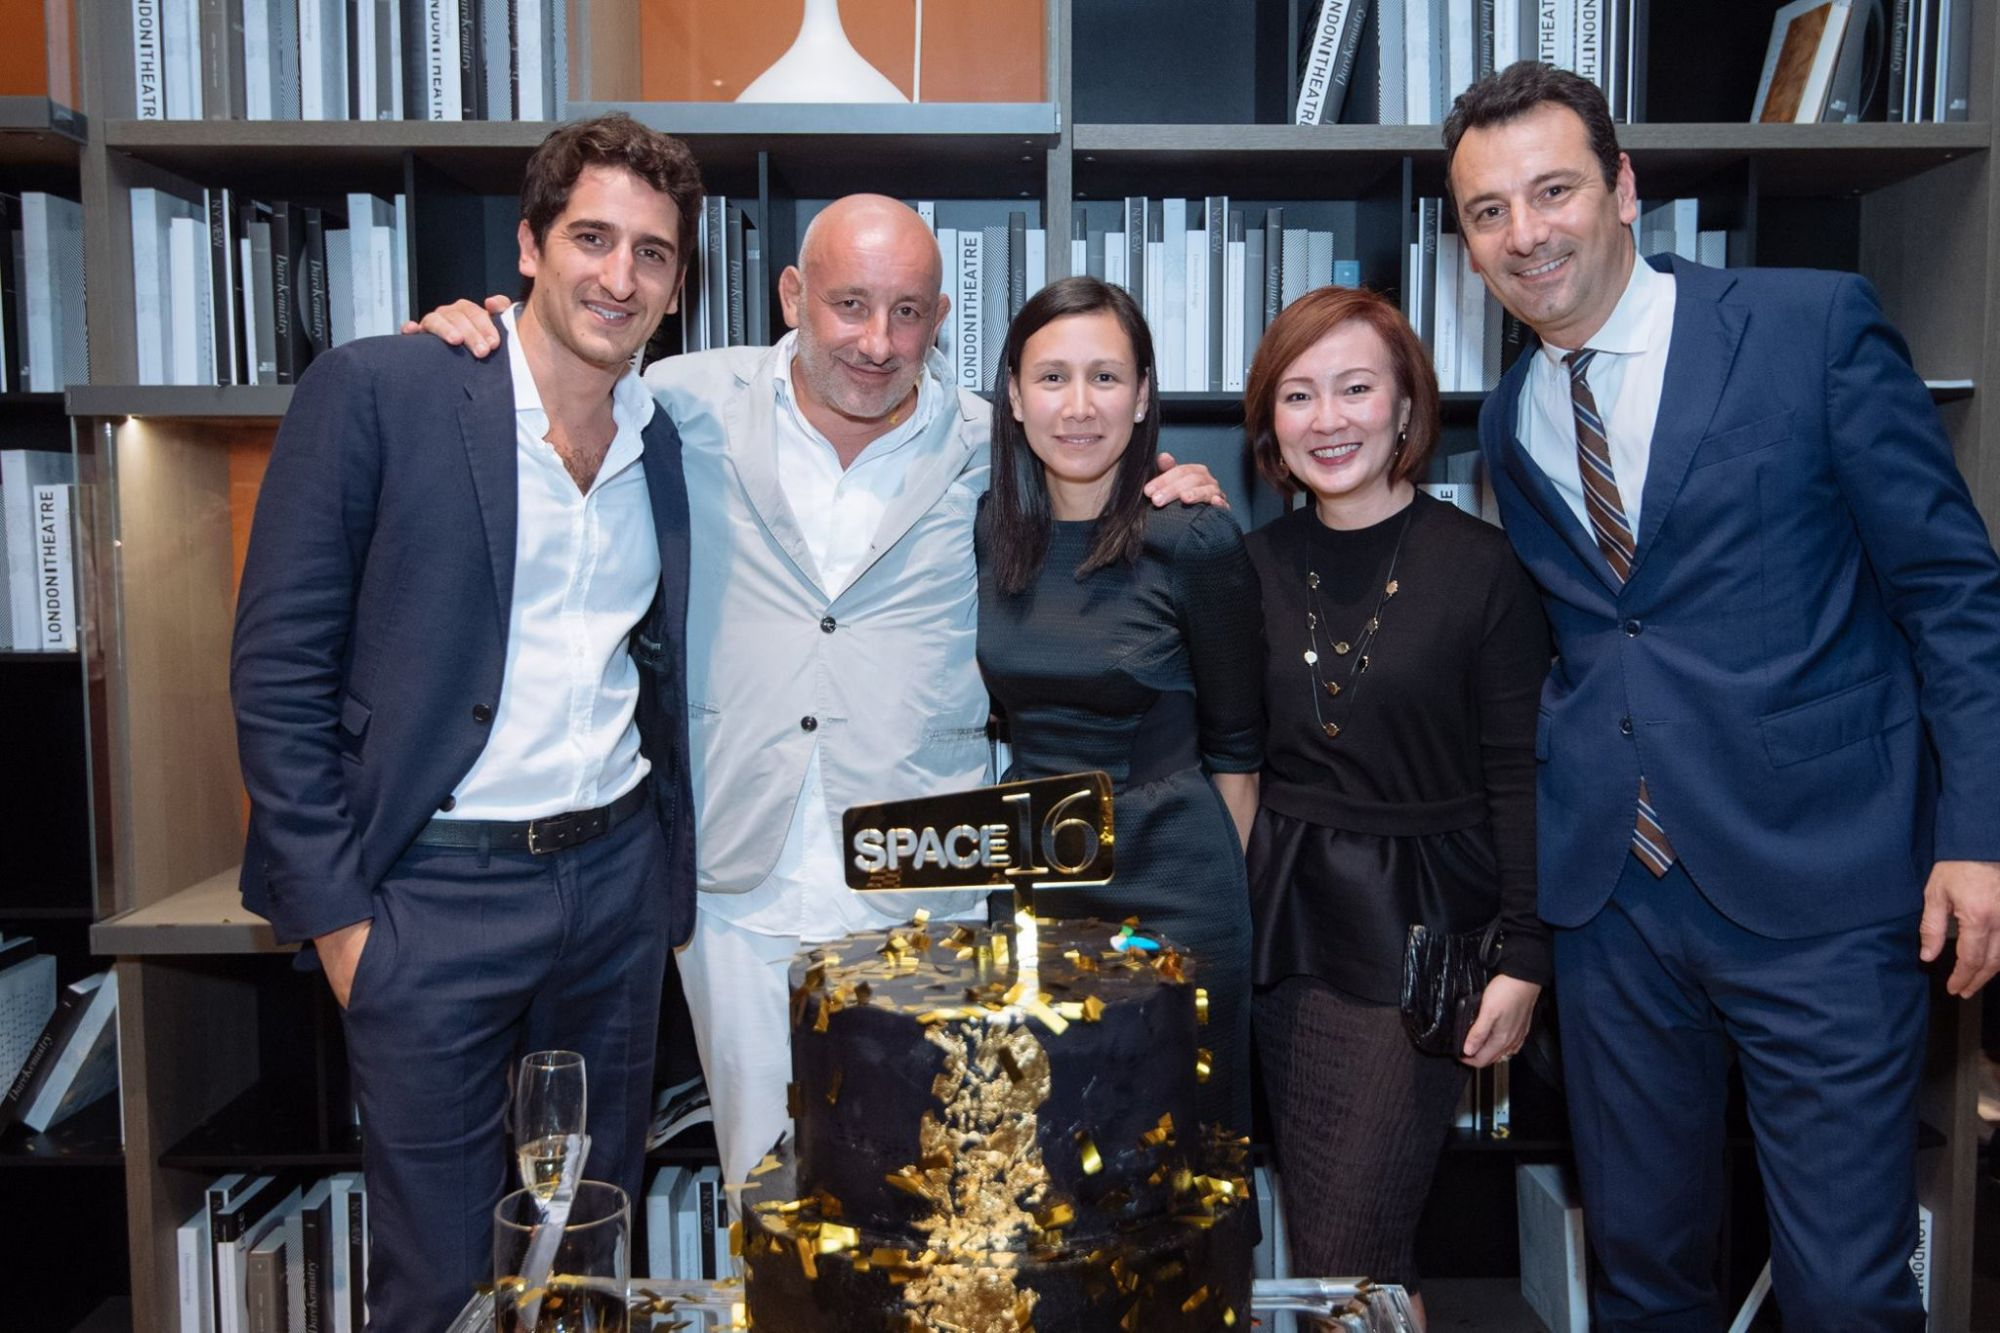 Marco Spinelli, Jean-Marie Massaud, Christina Caredes, Jennifer Soh, Marco Longoni